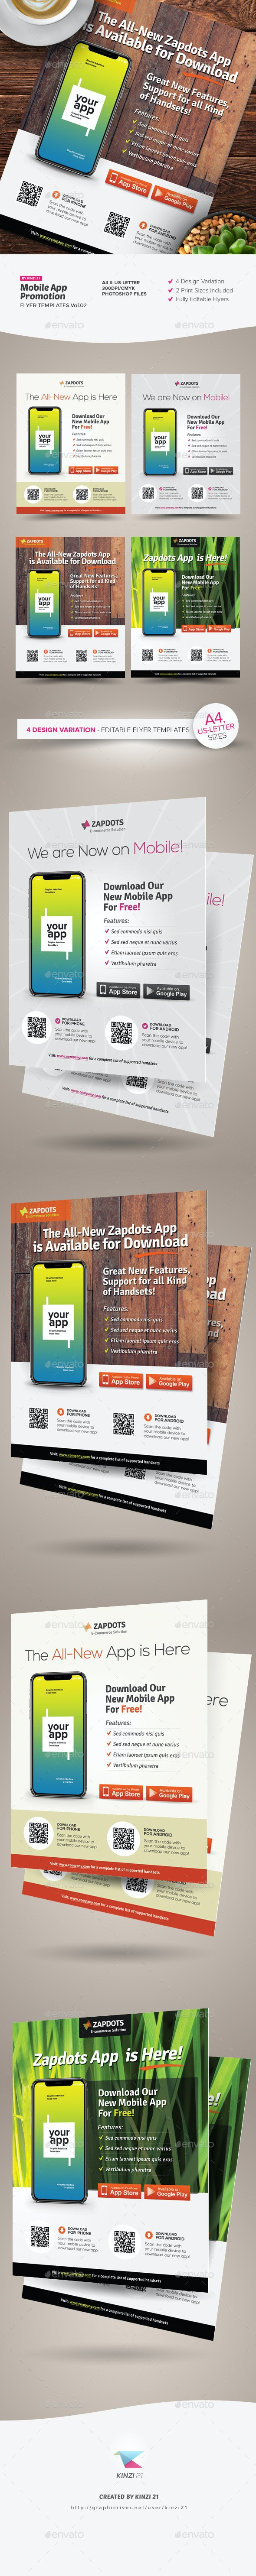 Mobile App Promotion Flyers Vol.02 - Corporate Flyers